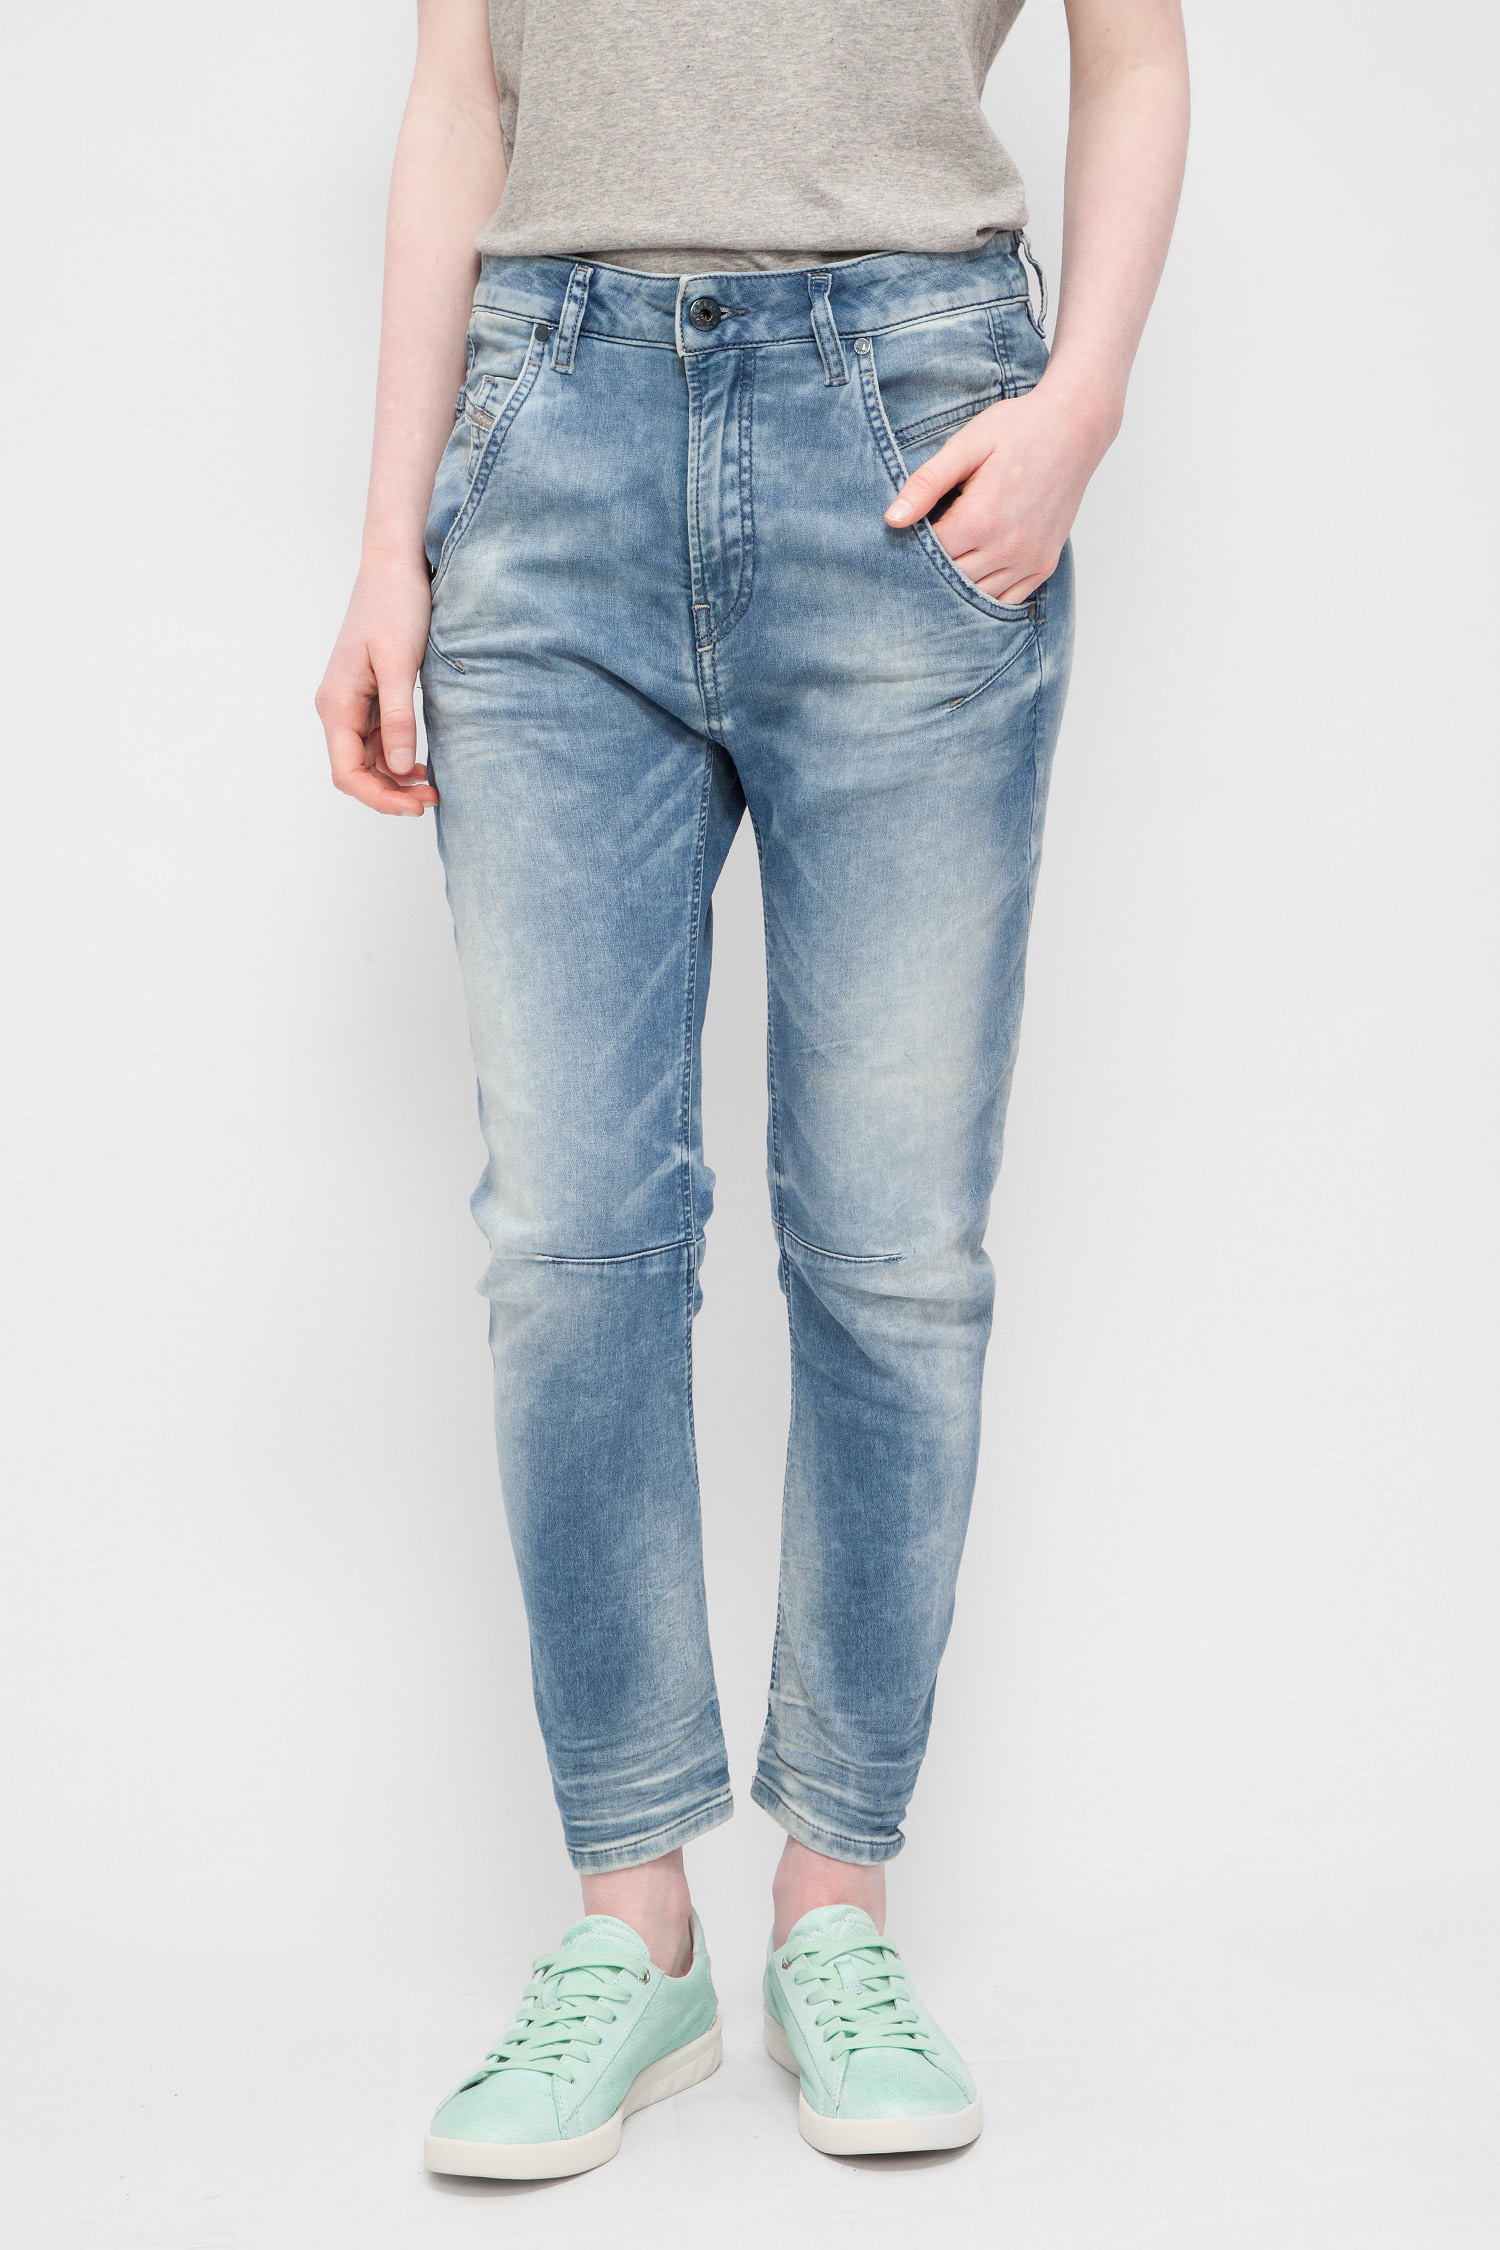 43b2f002fa61 Купить Женские синие джинсы FAYZA-NE Sweat jeans Diesel Diesel 00CYQV 0855C  – Киев, Украина. Цены в ...